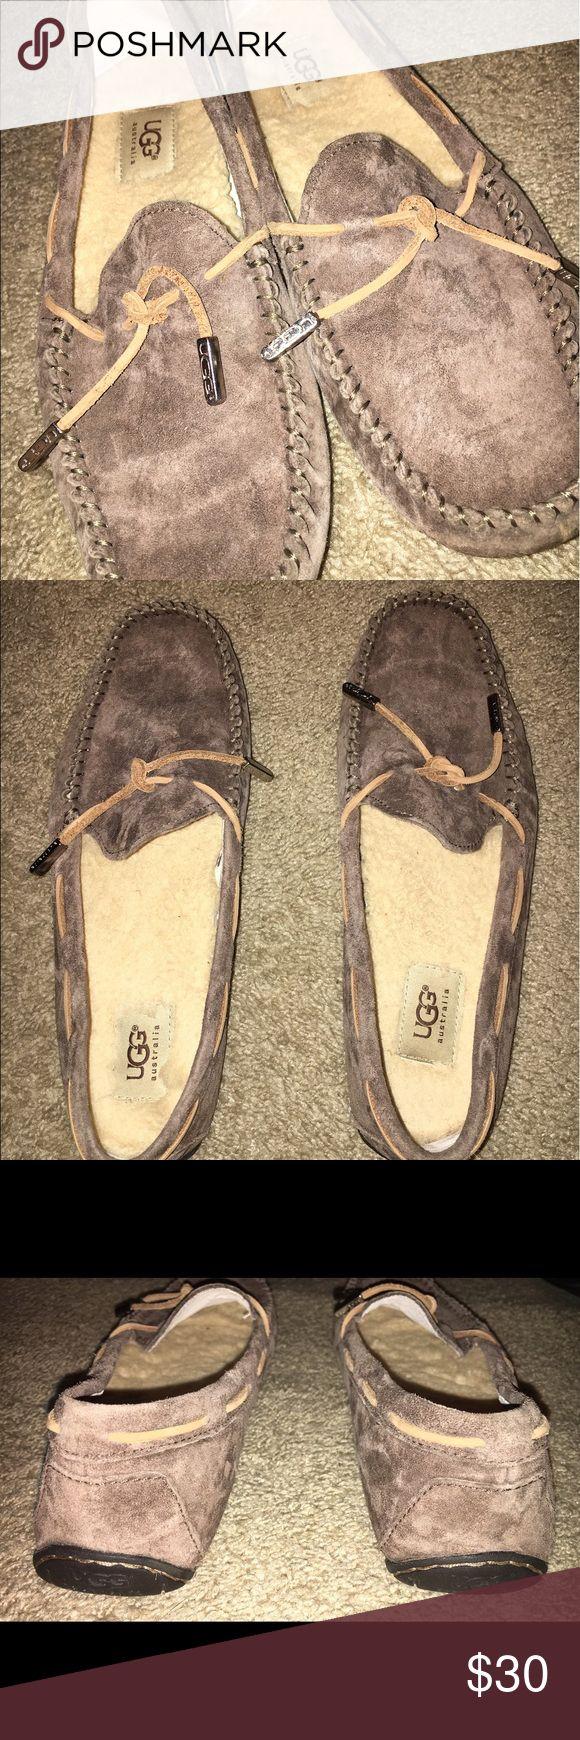 Ugg Australia Moccasins Gently worn mocha suede Ugg Australia moccasins! Comfortable and soft lambs wool footbed!!! UGG Shoes Moccasins